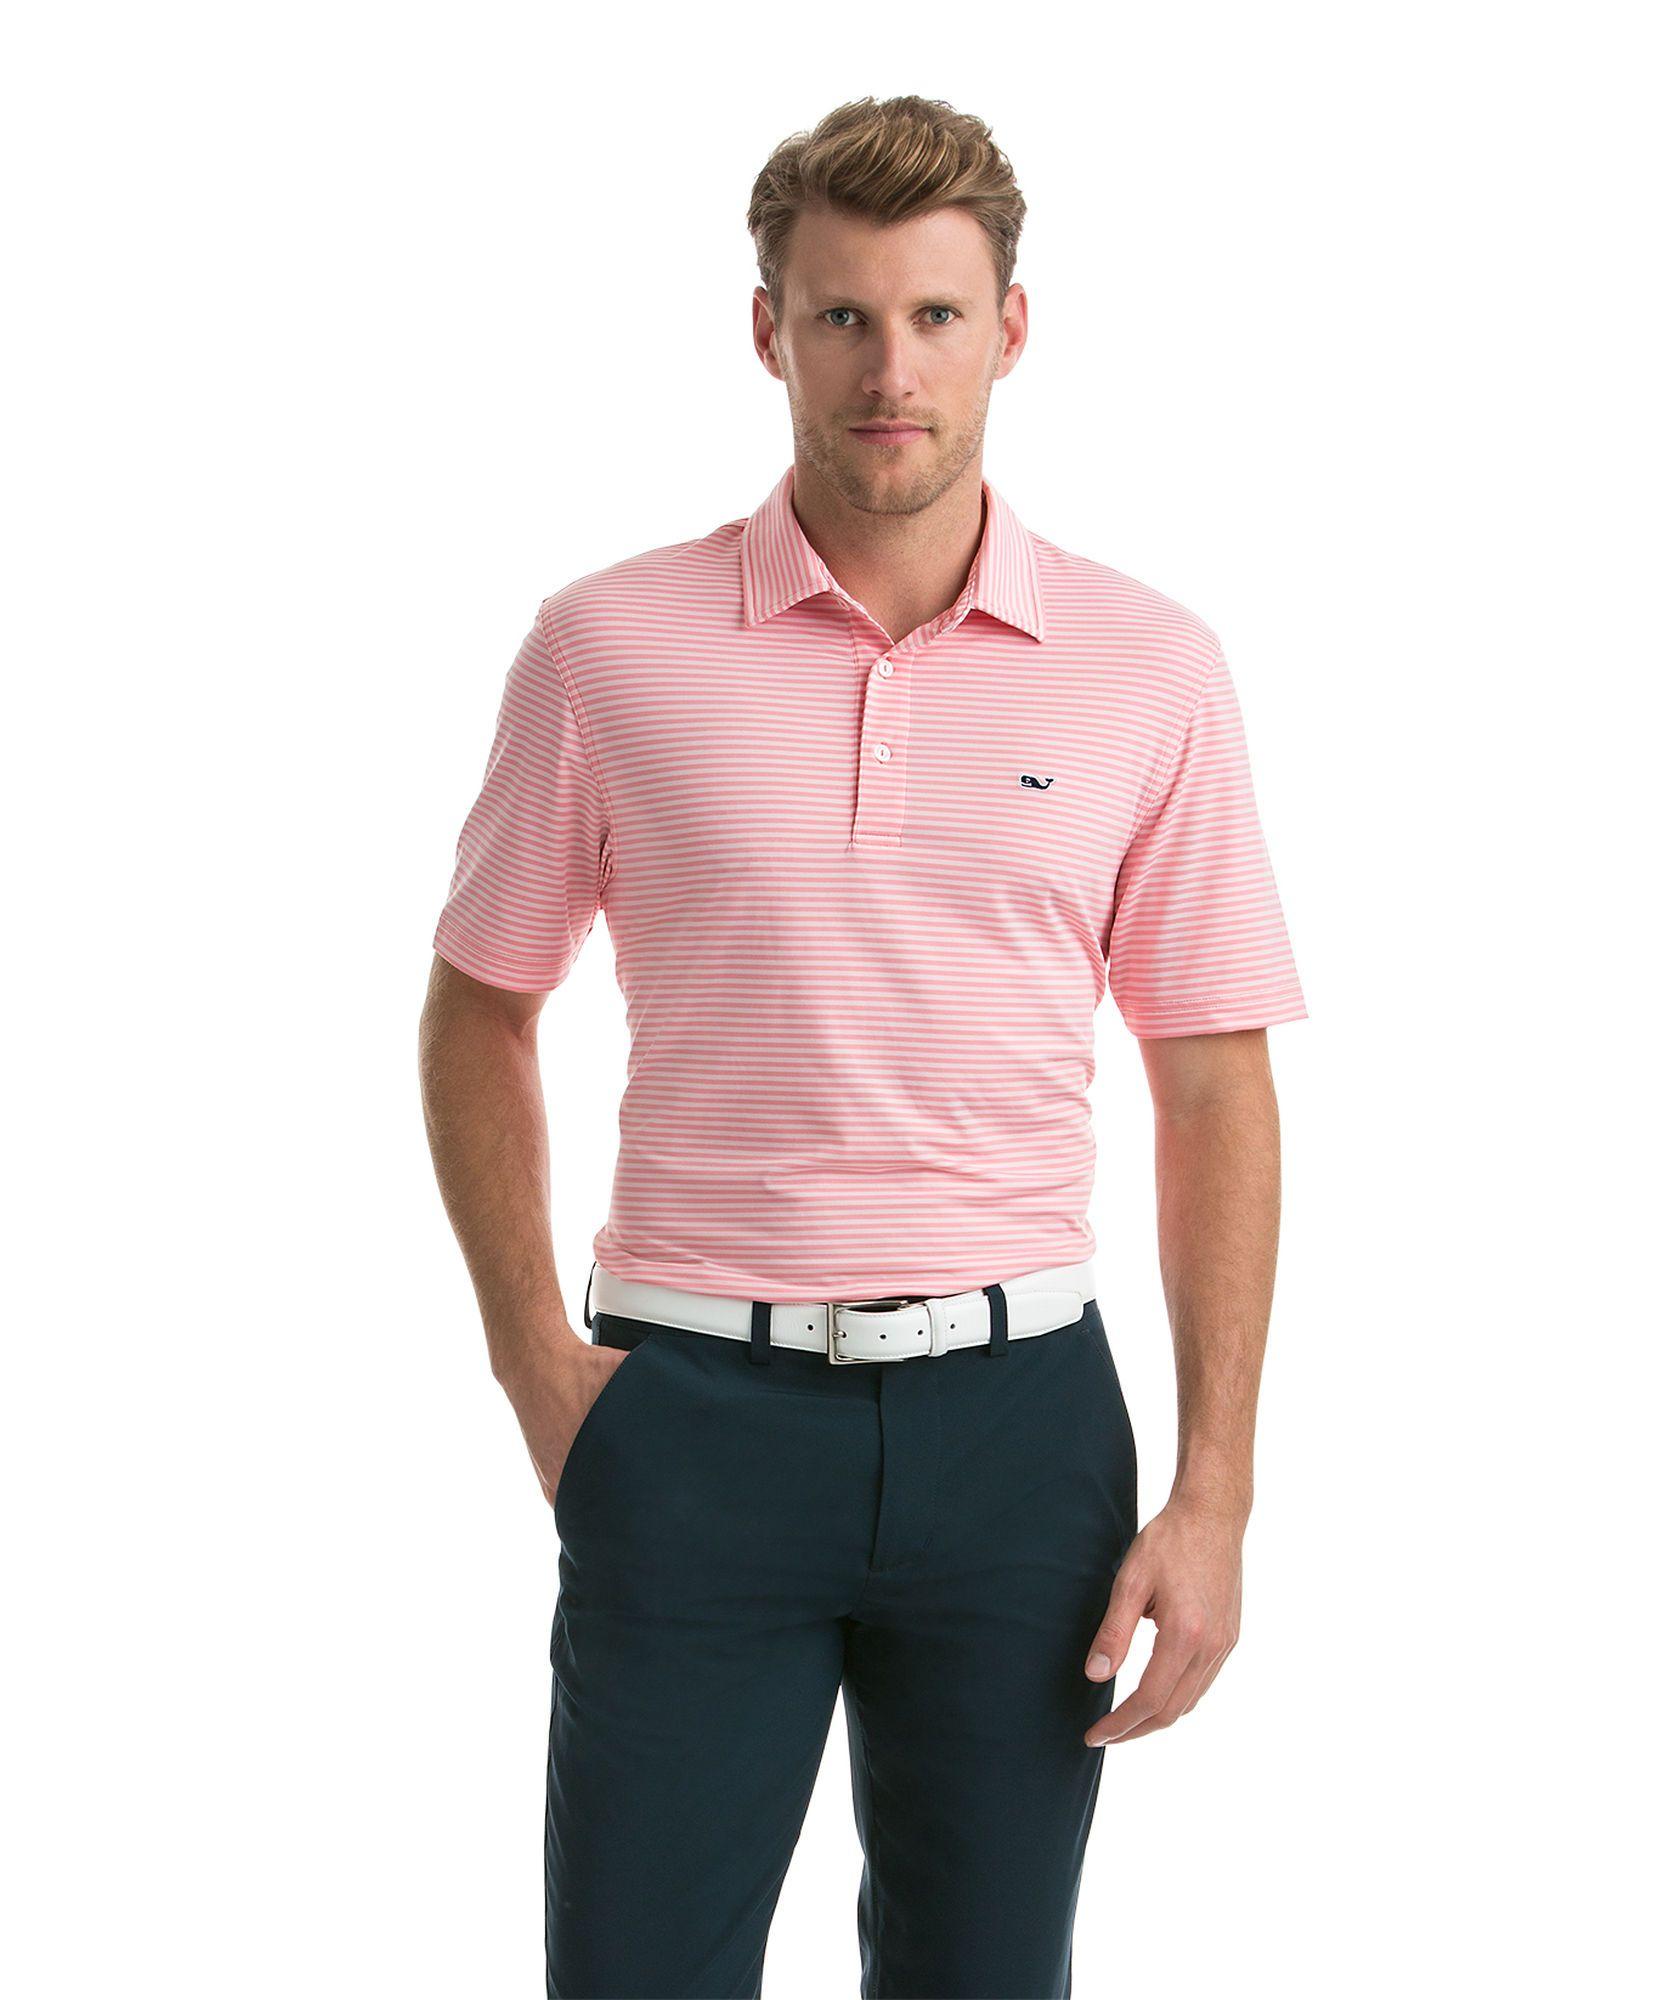 6b38f464 Kennedy Stripe Polo, $85 (color Flamingo) | Golf Shirts | Polo, Mens ...